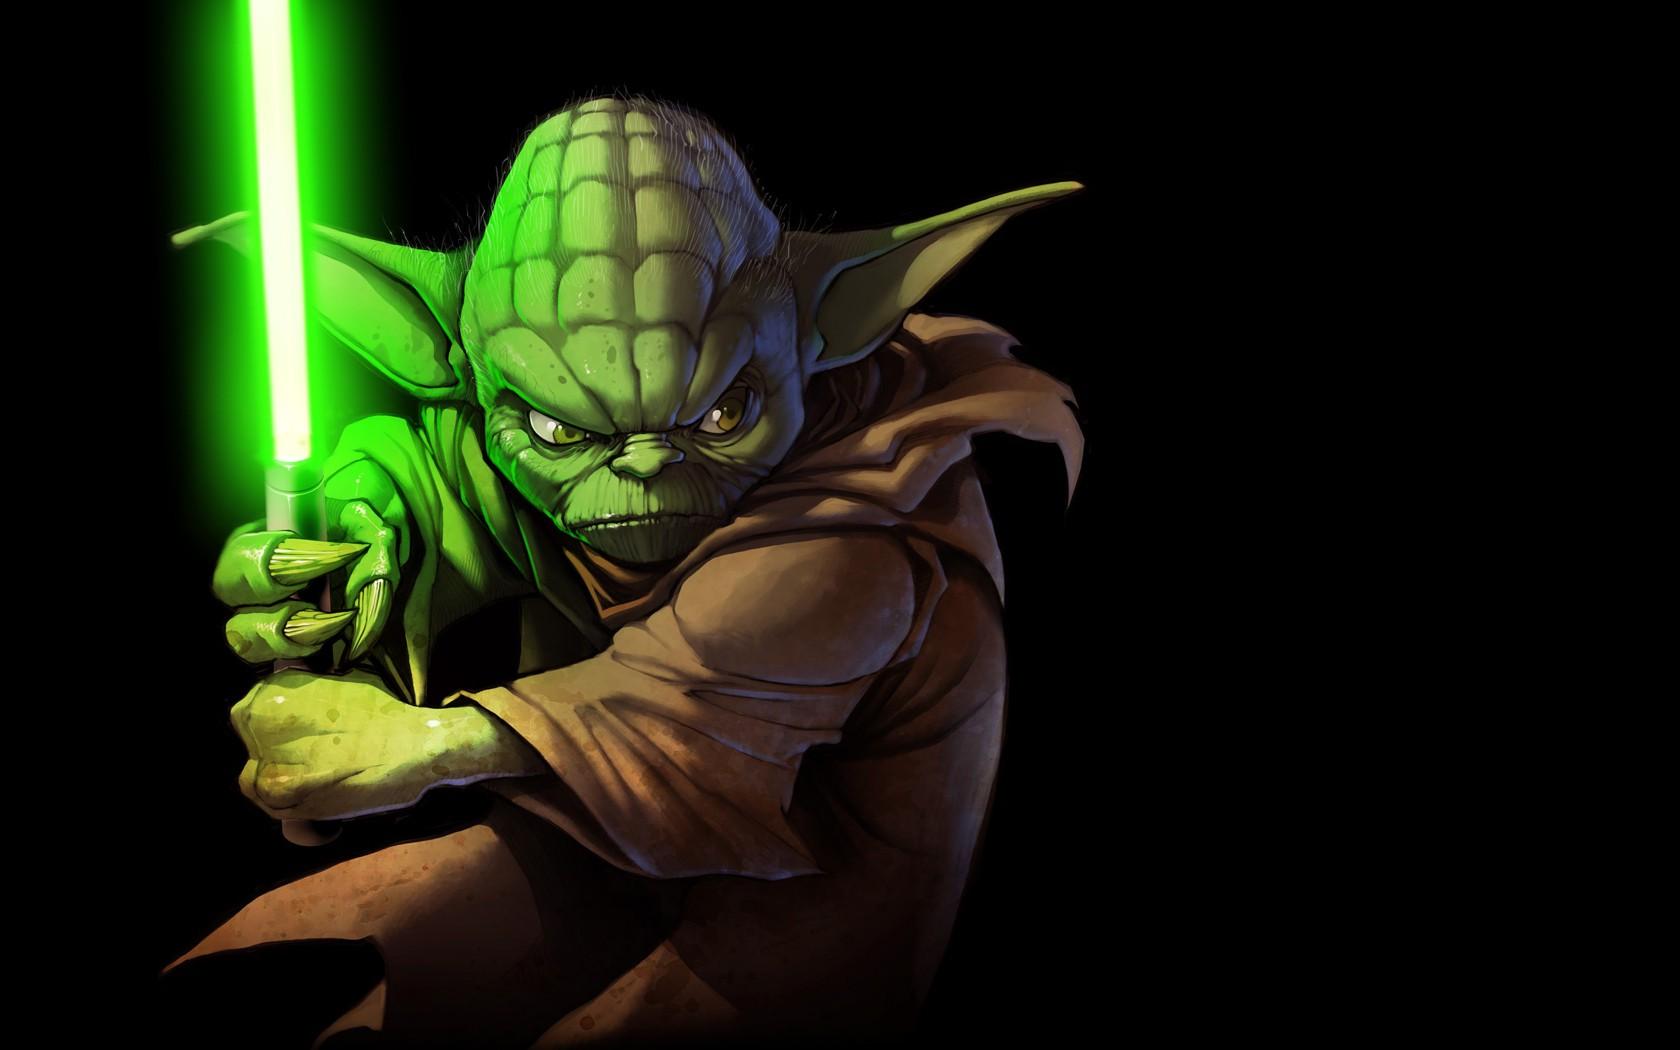 Star Wars Wallpaper Yoda 1680x1050 Wallpaper Teahub Io